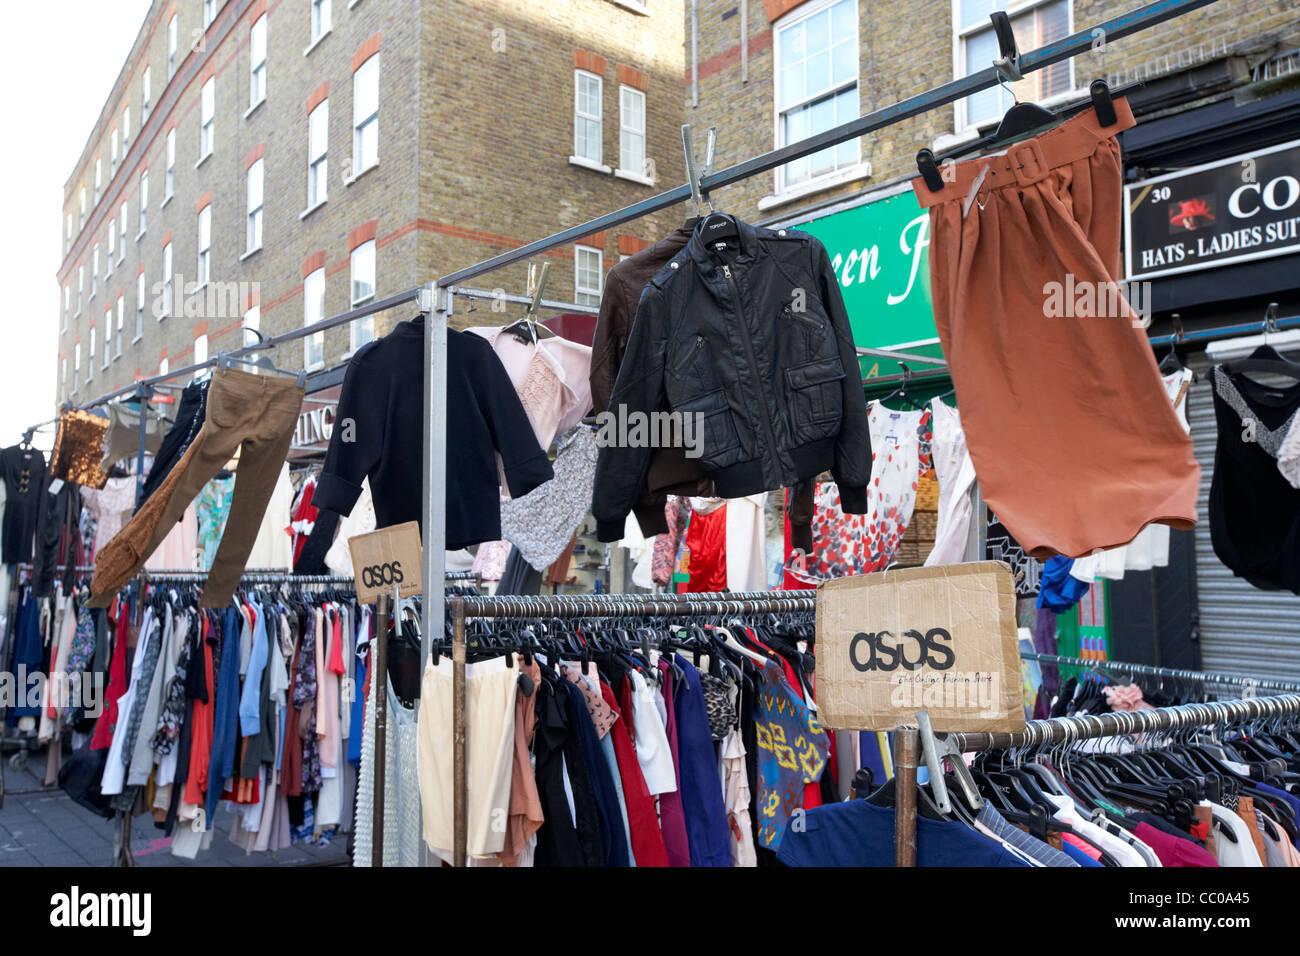 Vêtements street market Petticoat Lane London England uk united kingdom Photo Stock